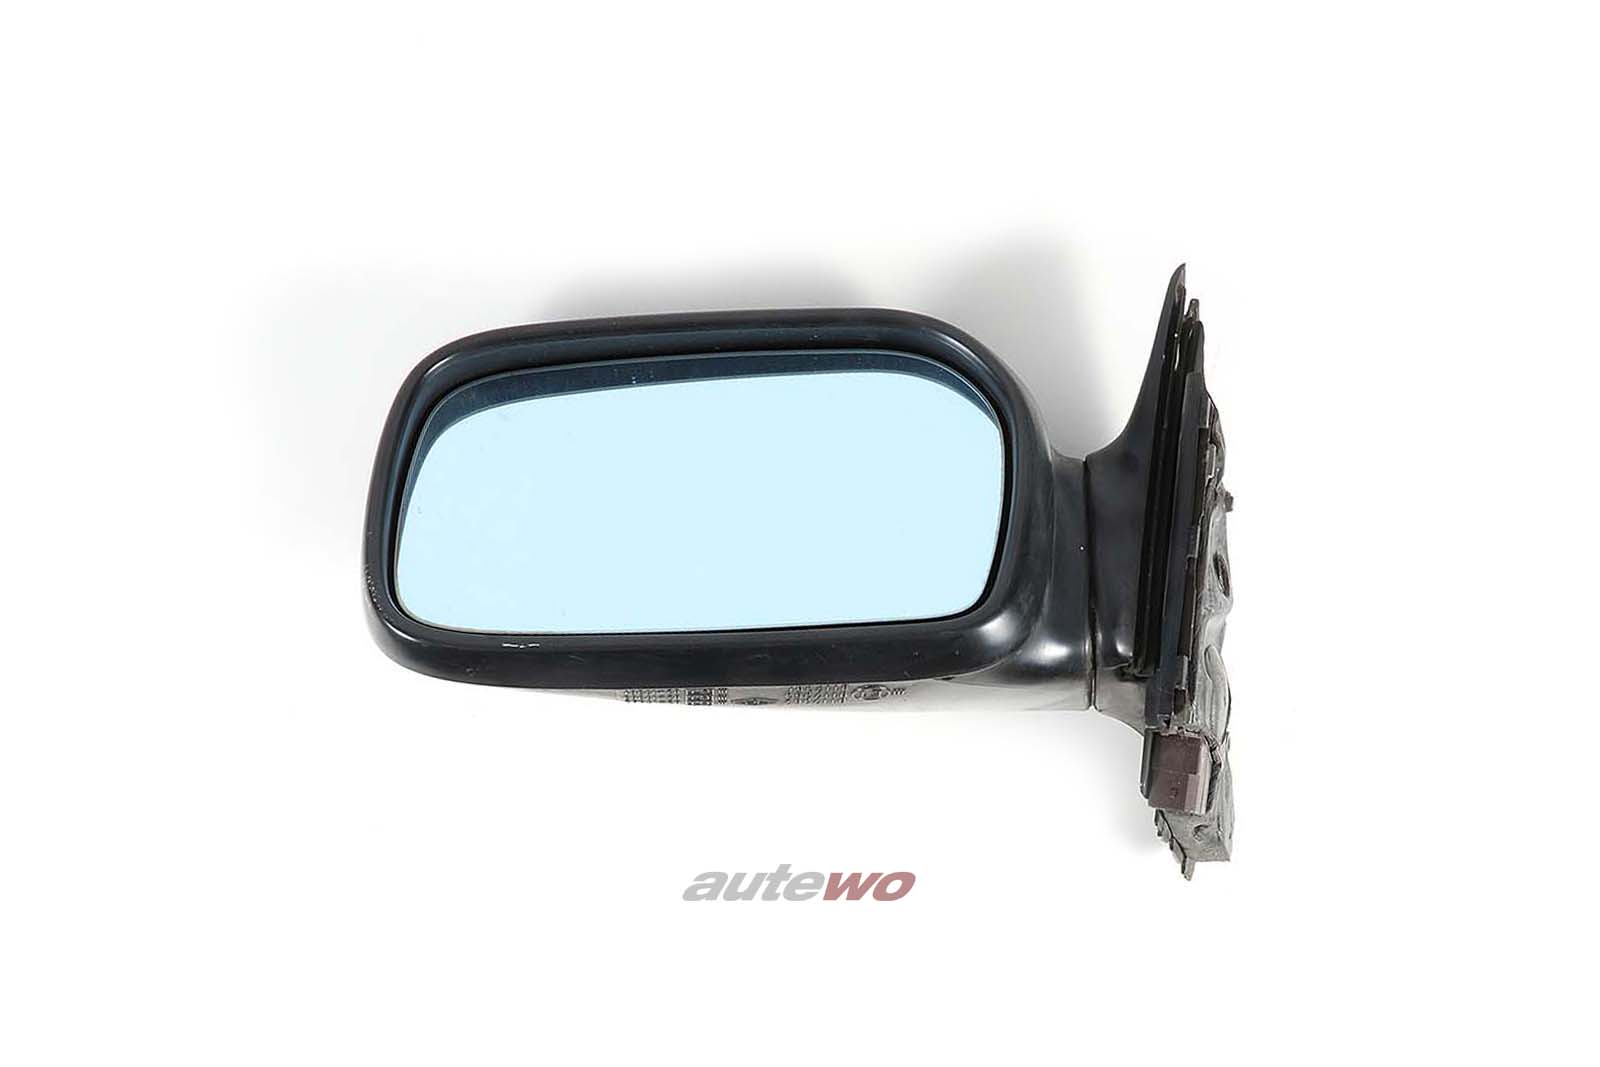 4A1857501H Audi 100/S4 C4 elektr. Außenspiegel Links schwarz